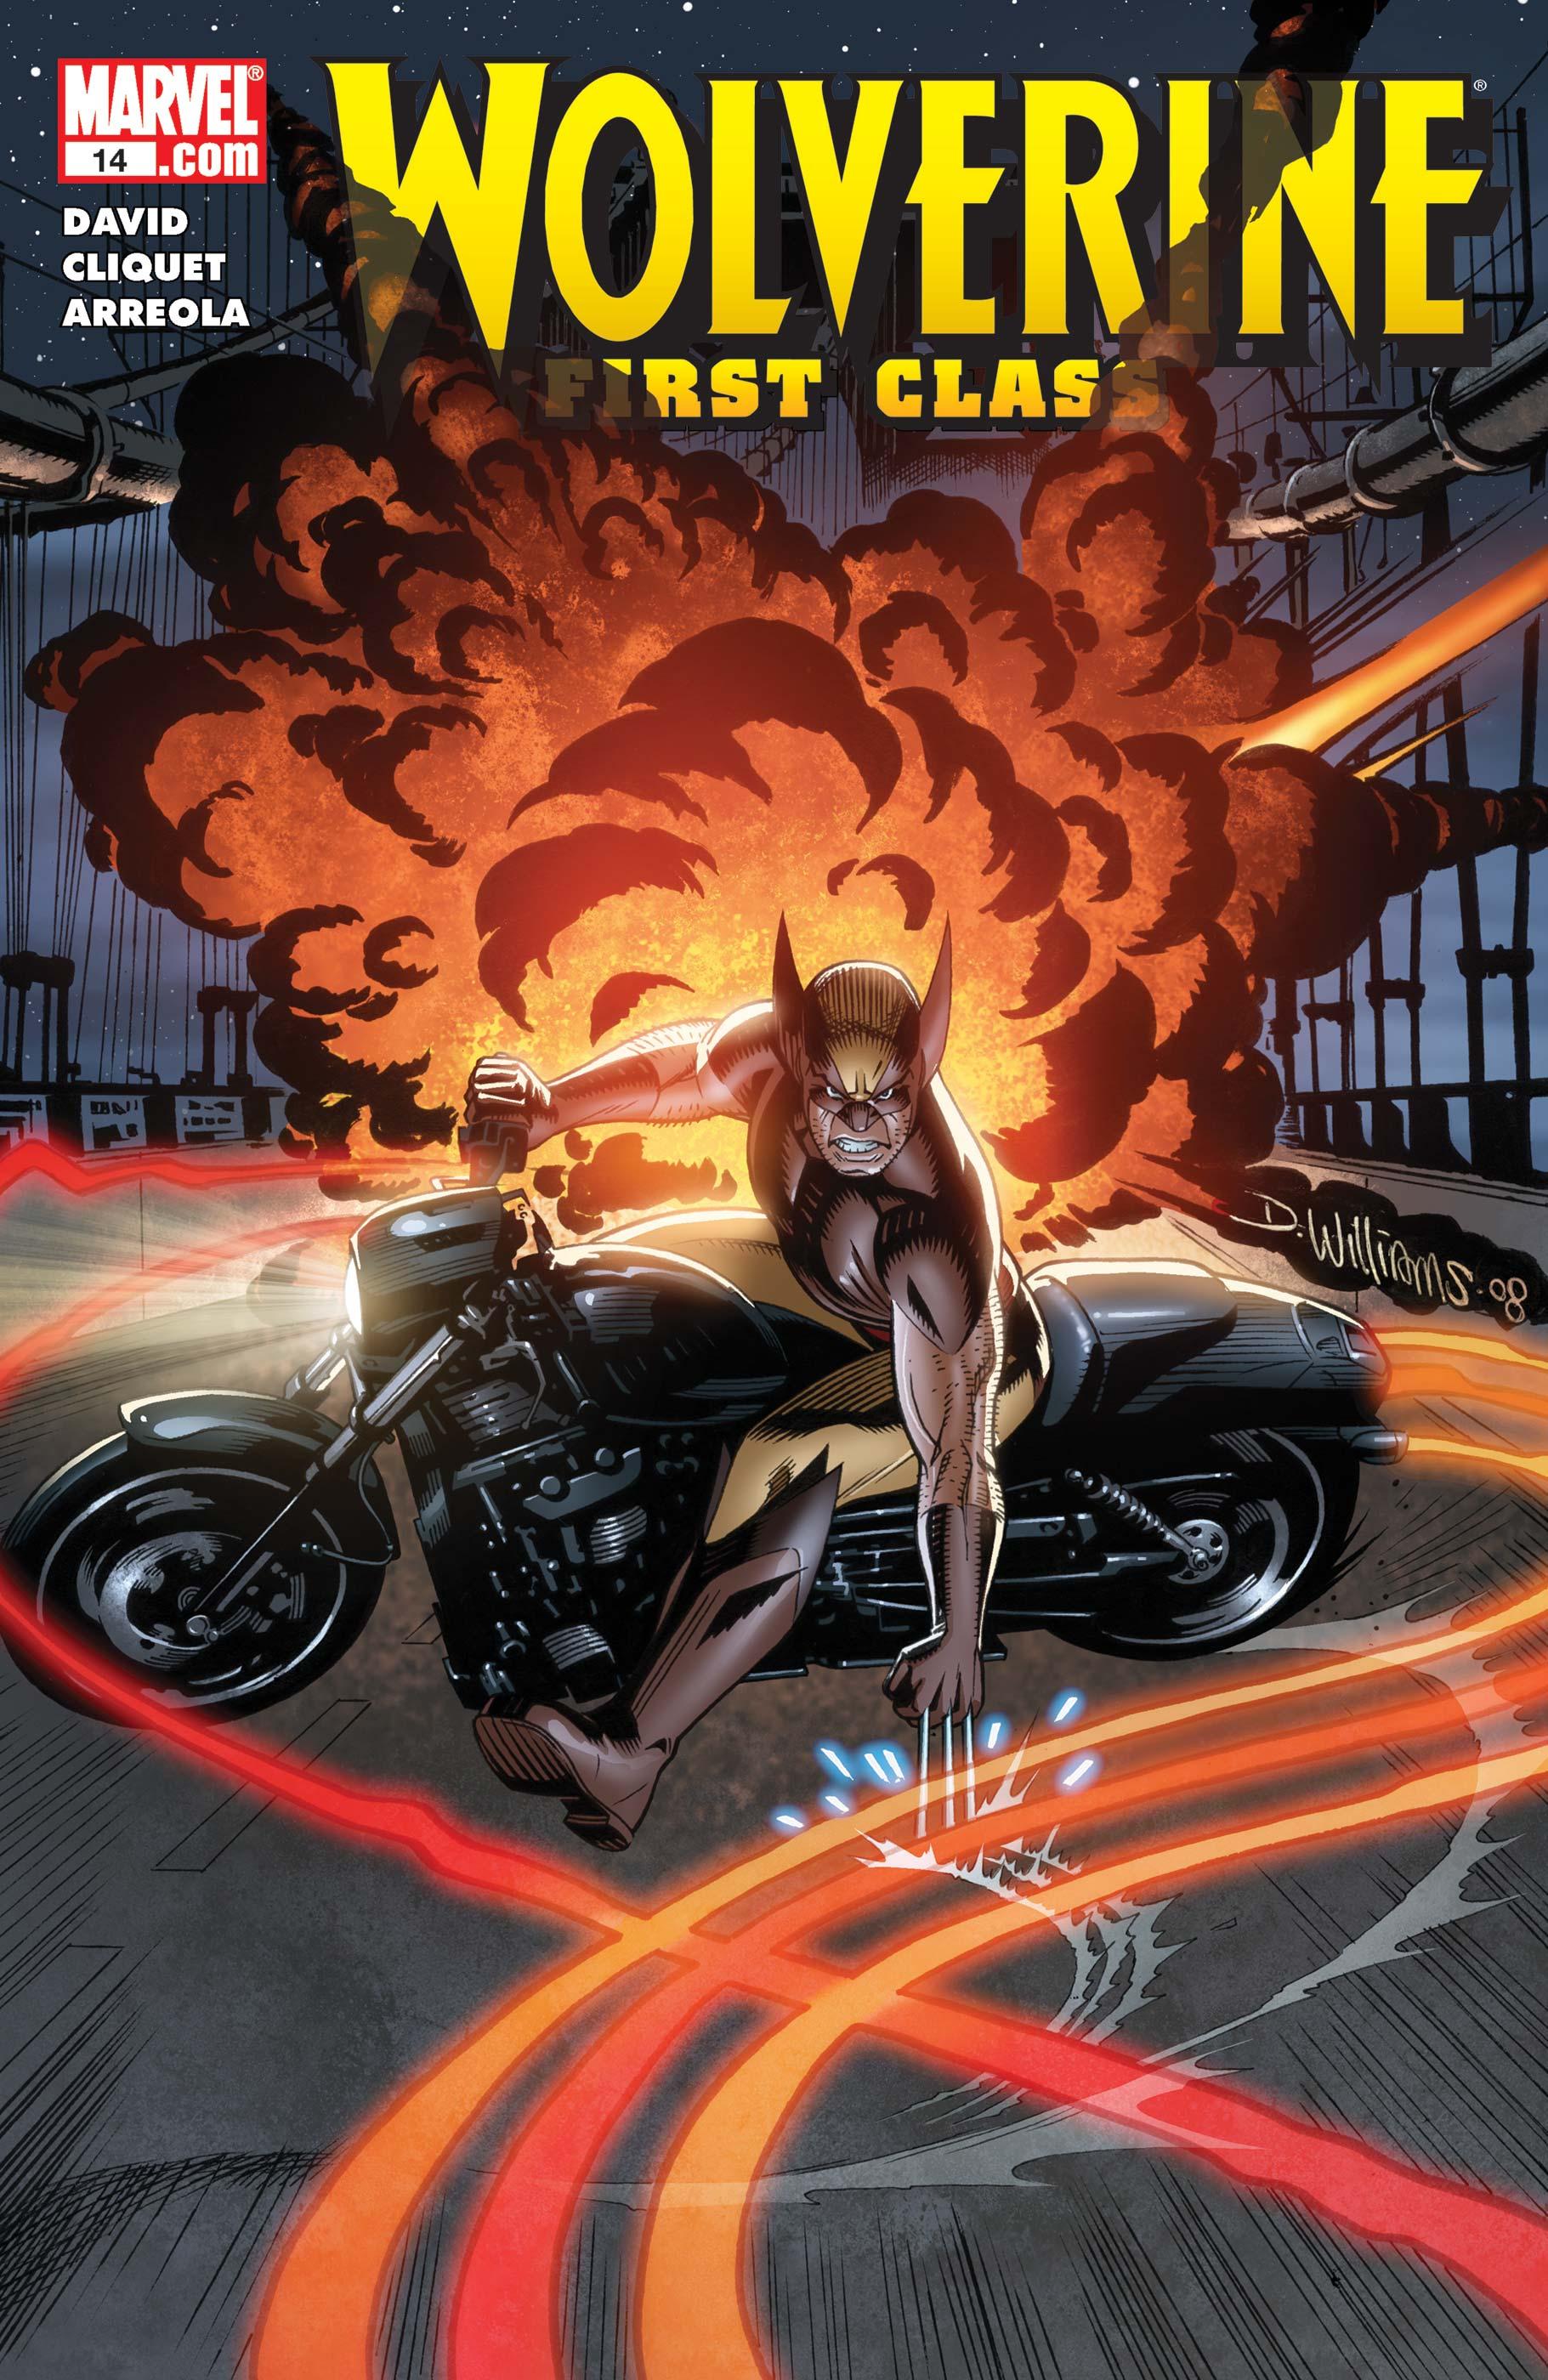 Wolverine: First Class (2008) #14